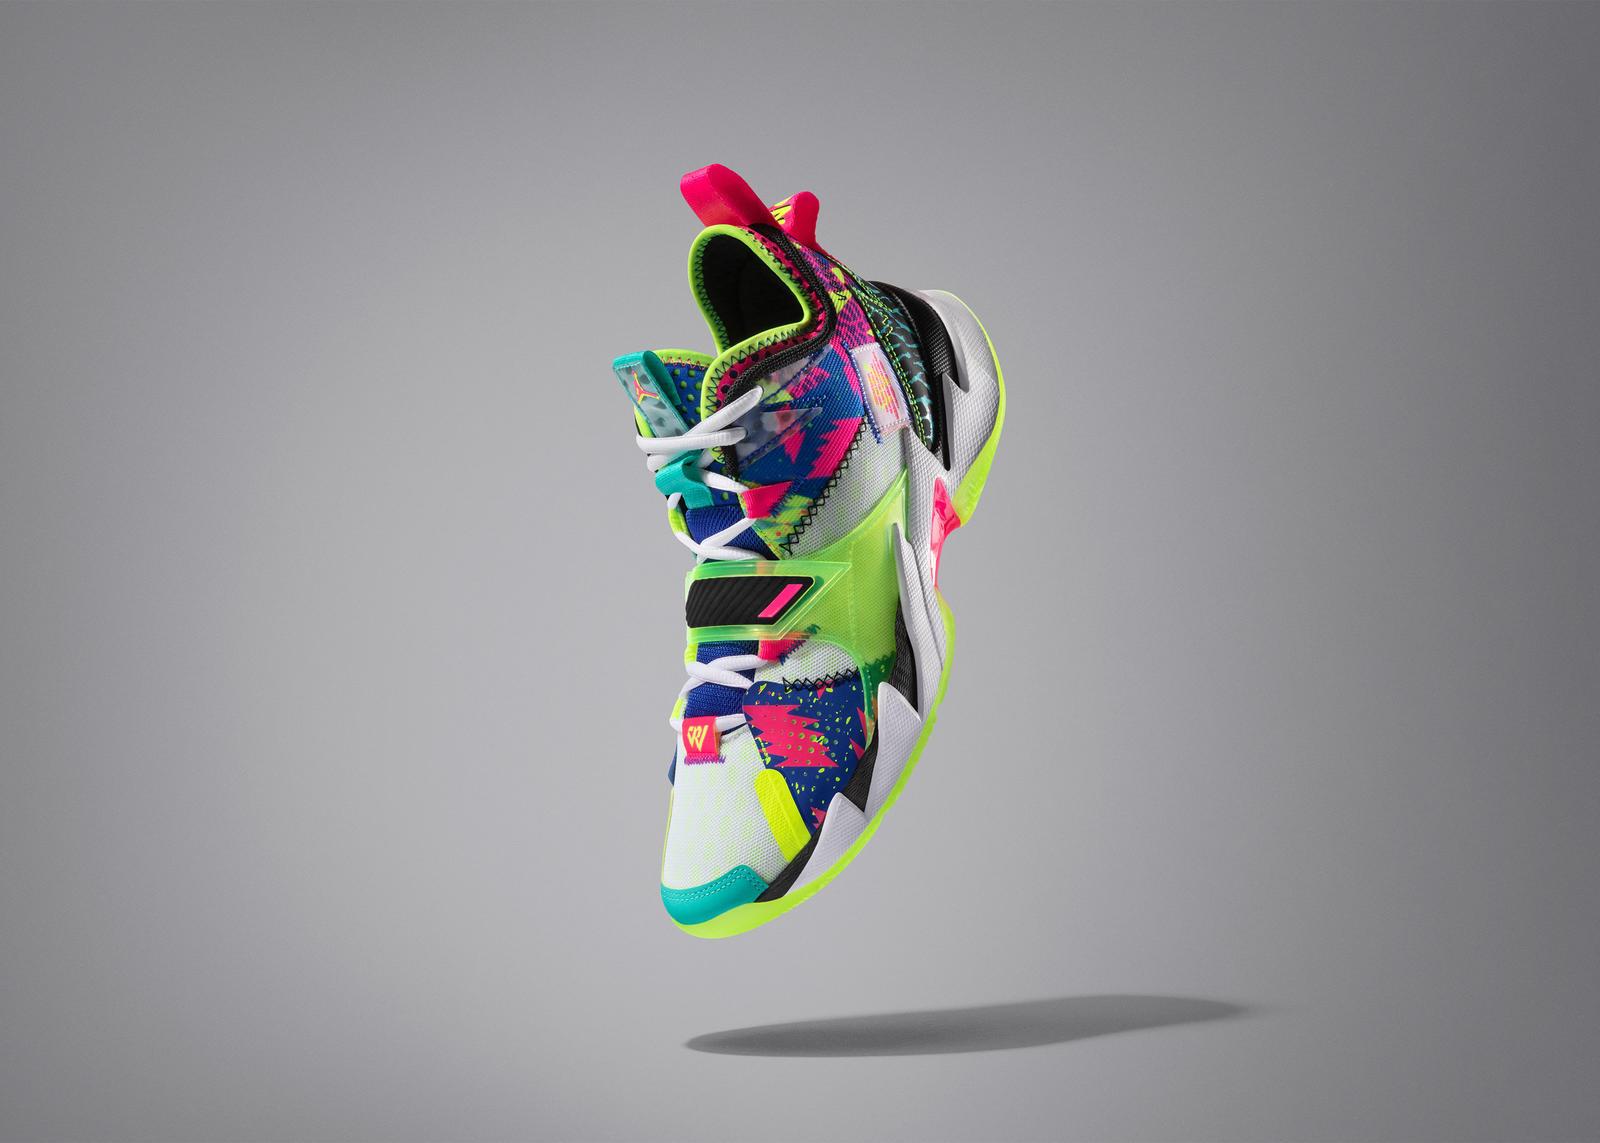 Nike Basketball Releasing Colorful PE